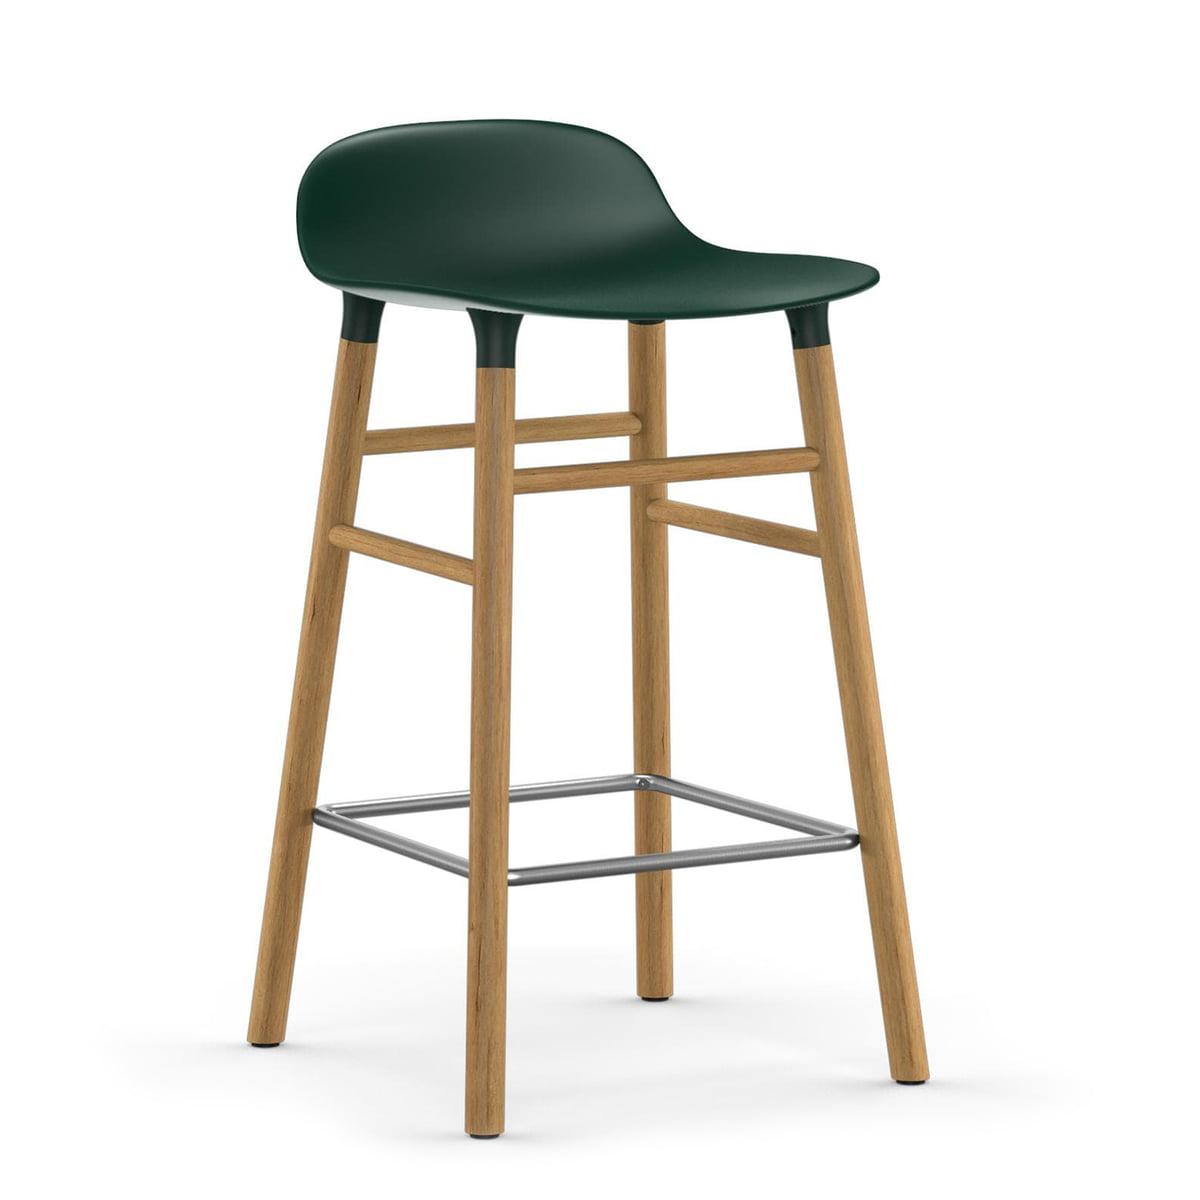 Normann Copenhagen - Form tabouret de bar 65 cm, piètement chêne / vert